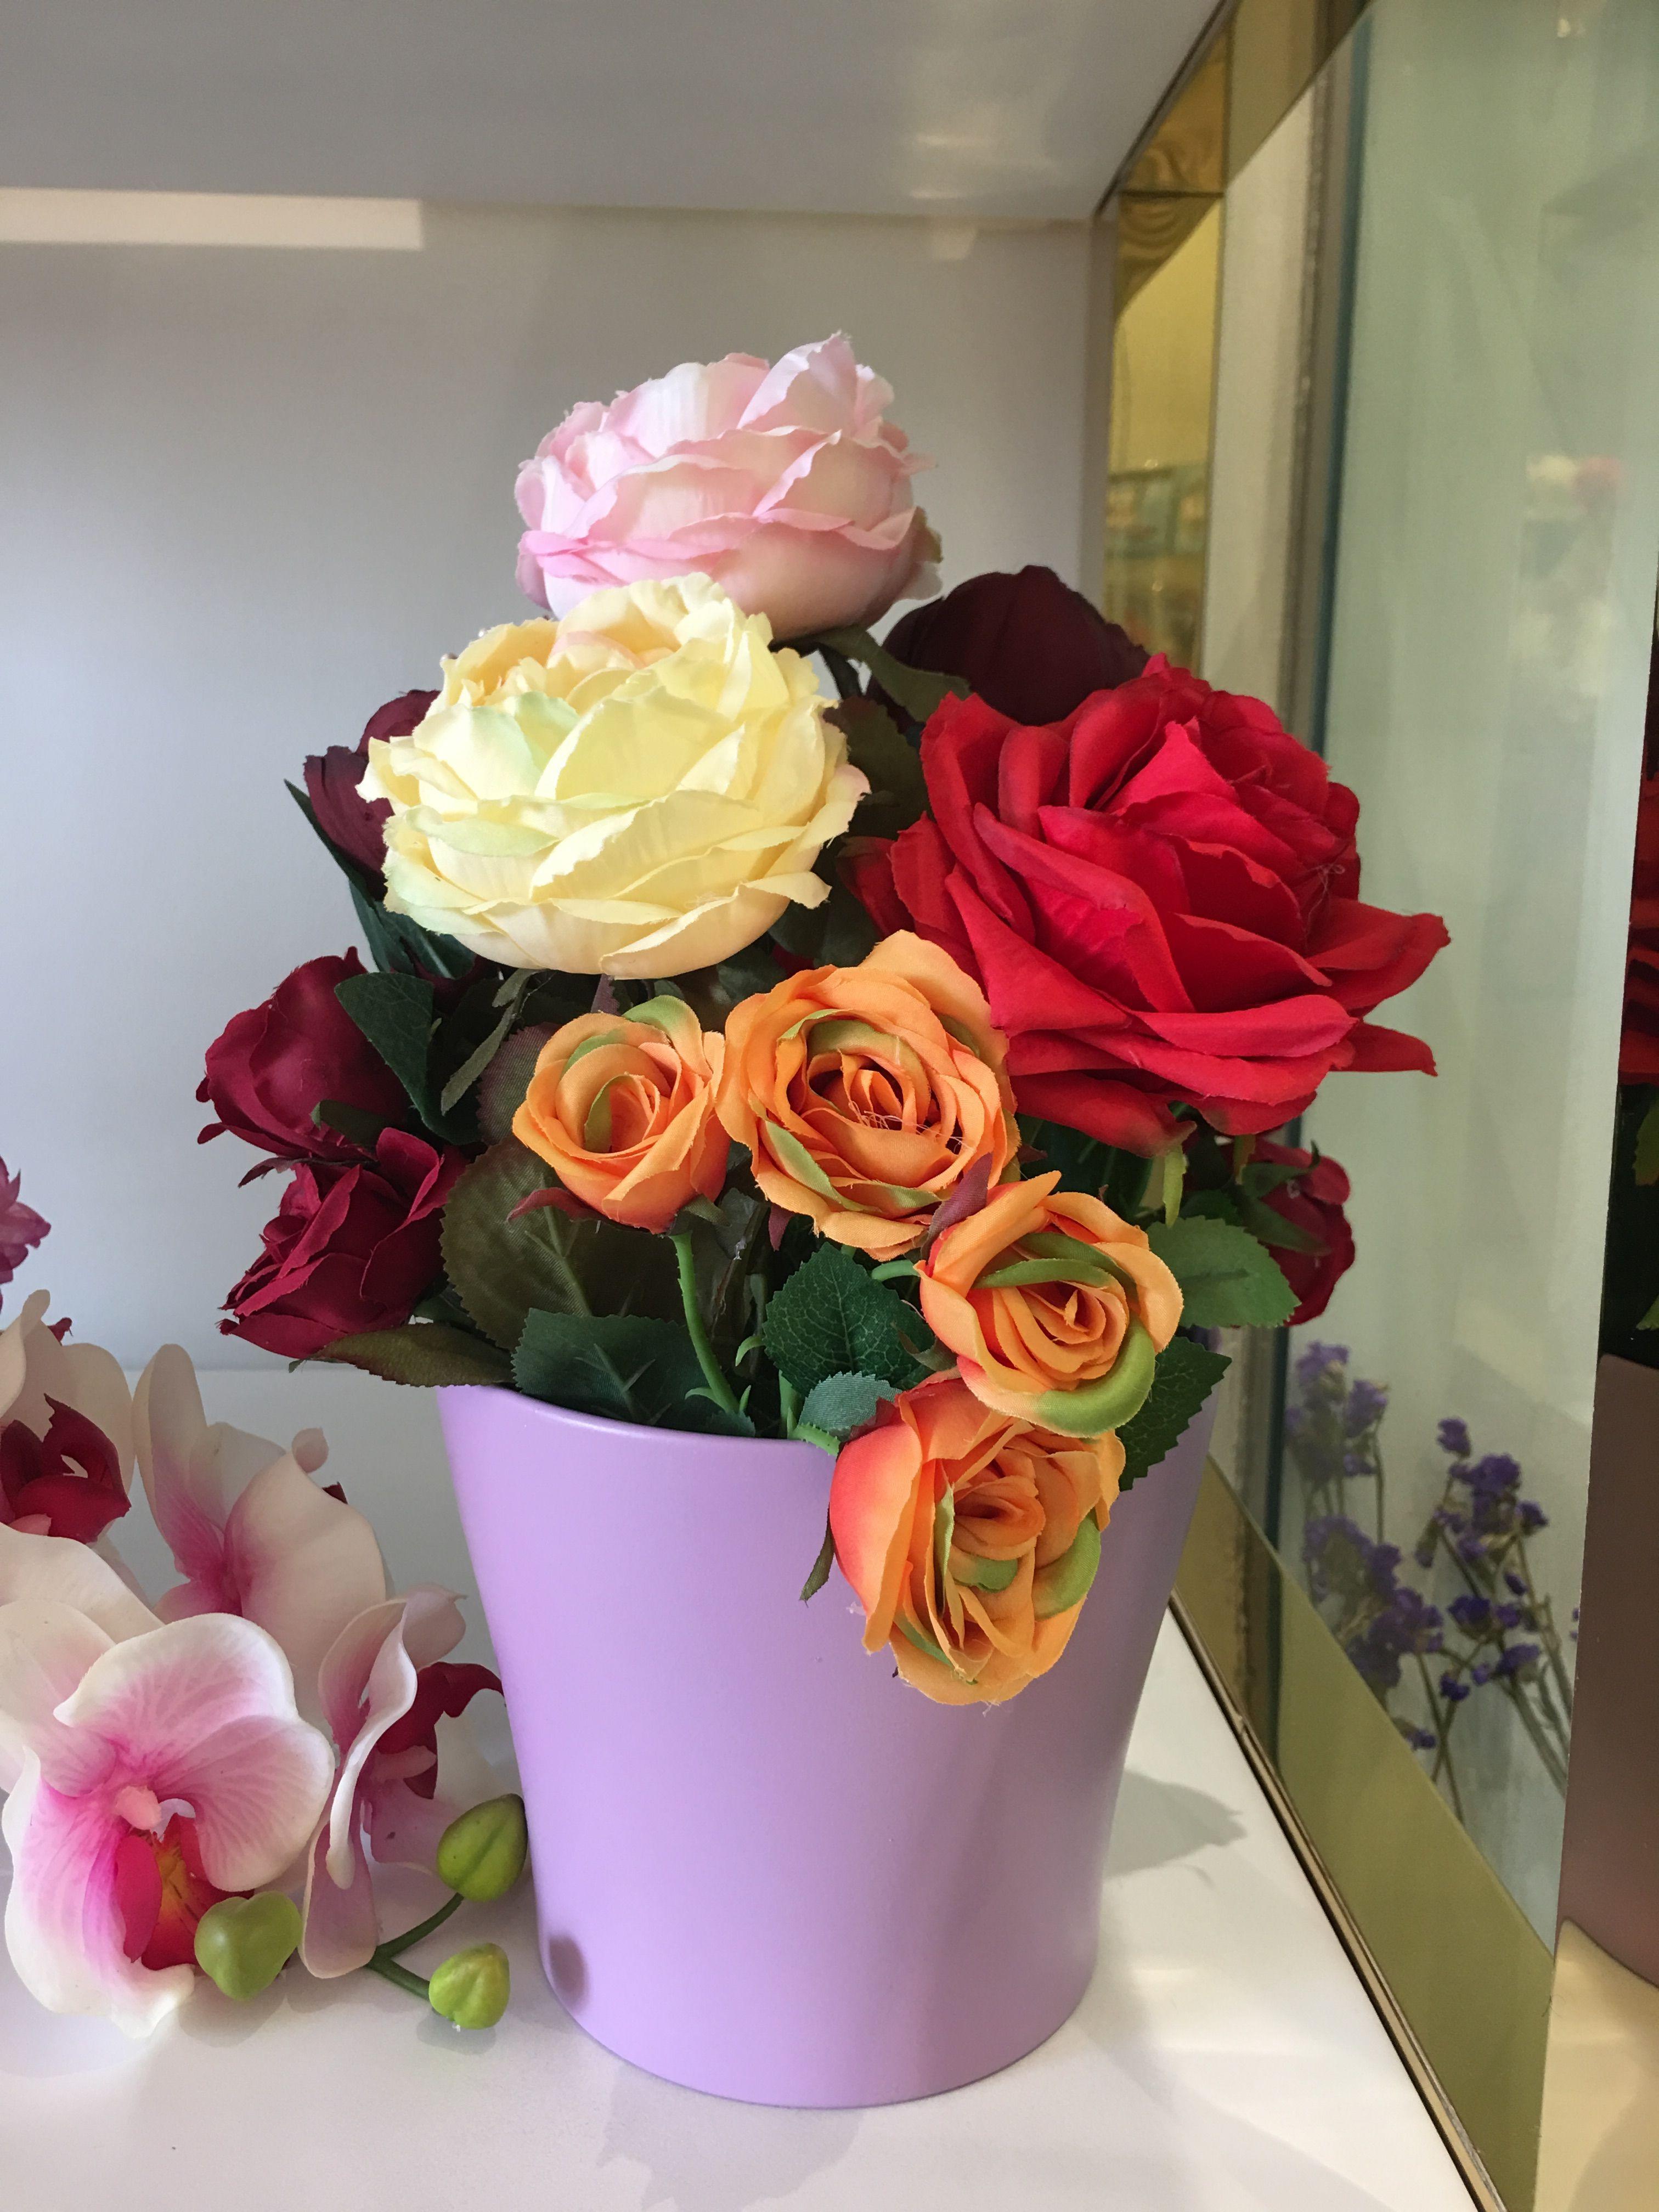 Dailyroses ورد ورد صناعي ورد طبيعي بوكيه ورد فازات فازات ورد تنسيق ورد خشبيات بالونات بالونات هيليوم محل ورد تخرج حفلا Rose Floral Wreath Floral